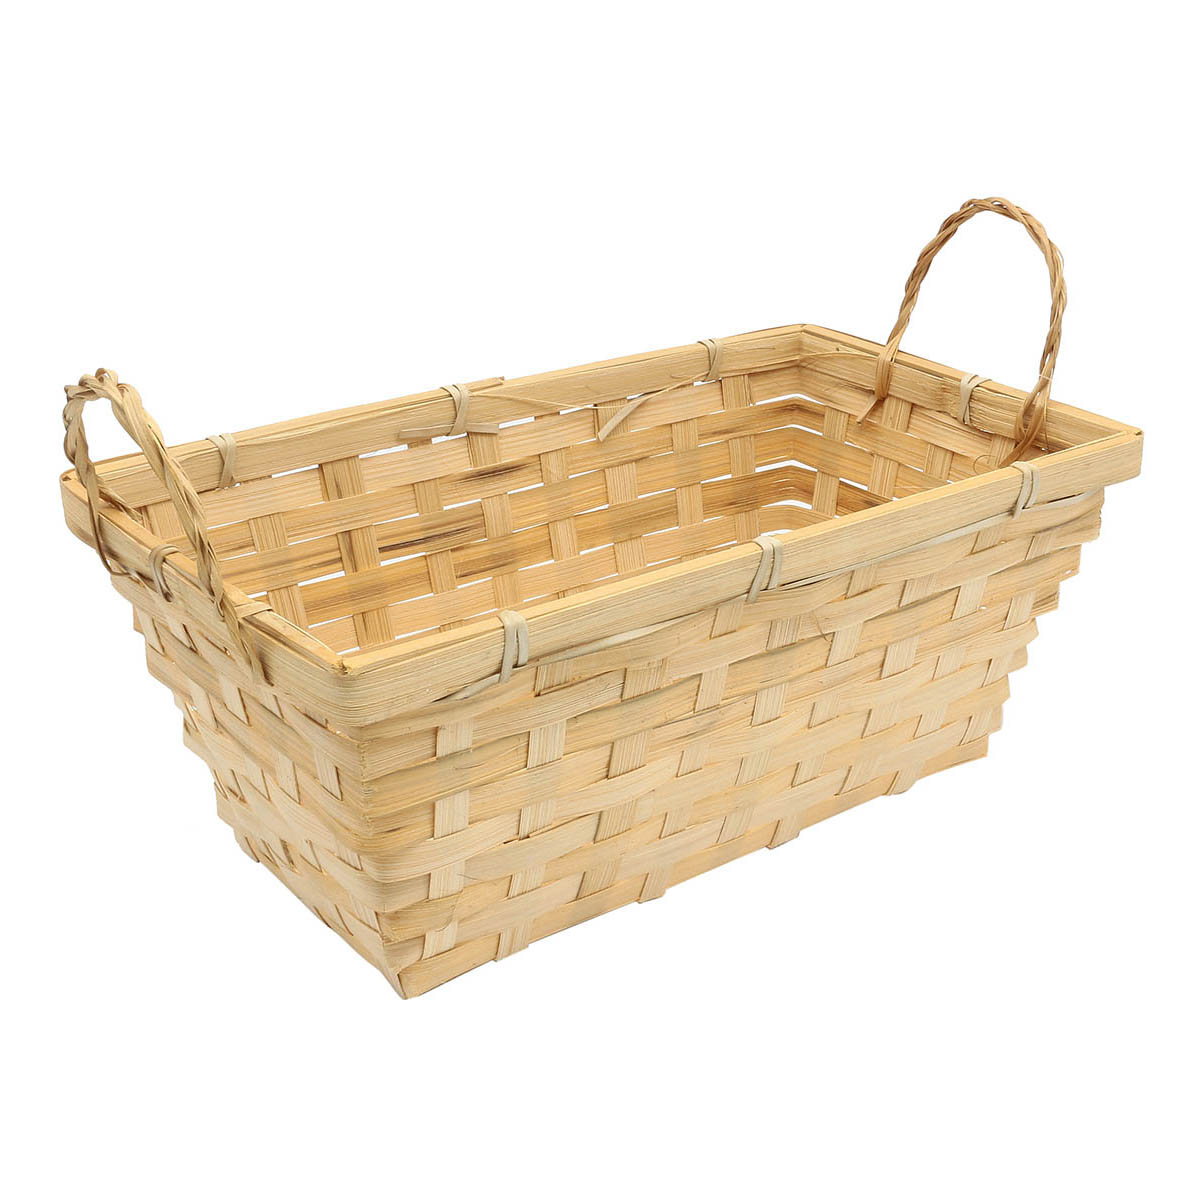 19HJ19086 Корзина плетеная бамбук 27,5*15*Н11см, цв. натуральный Астра